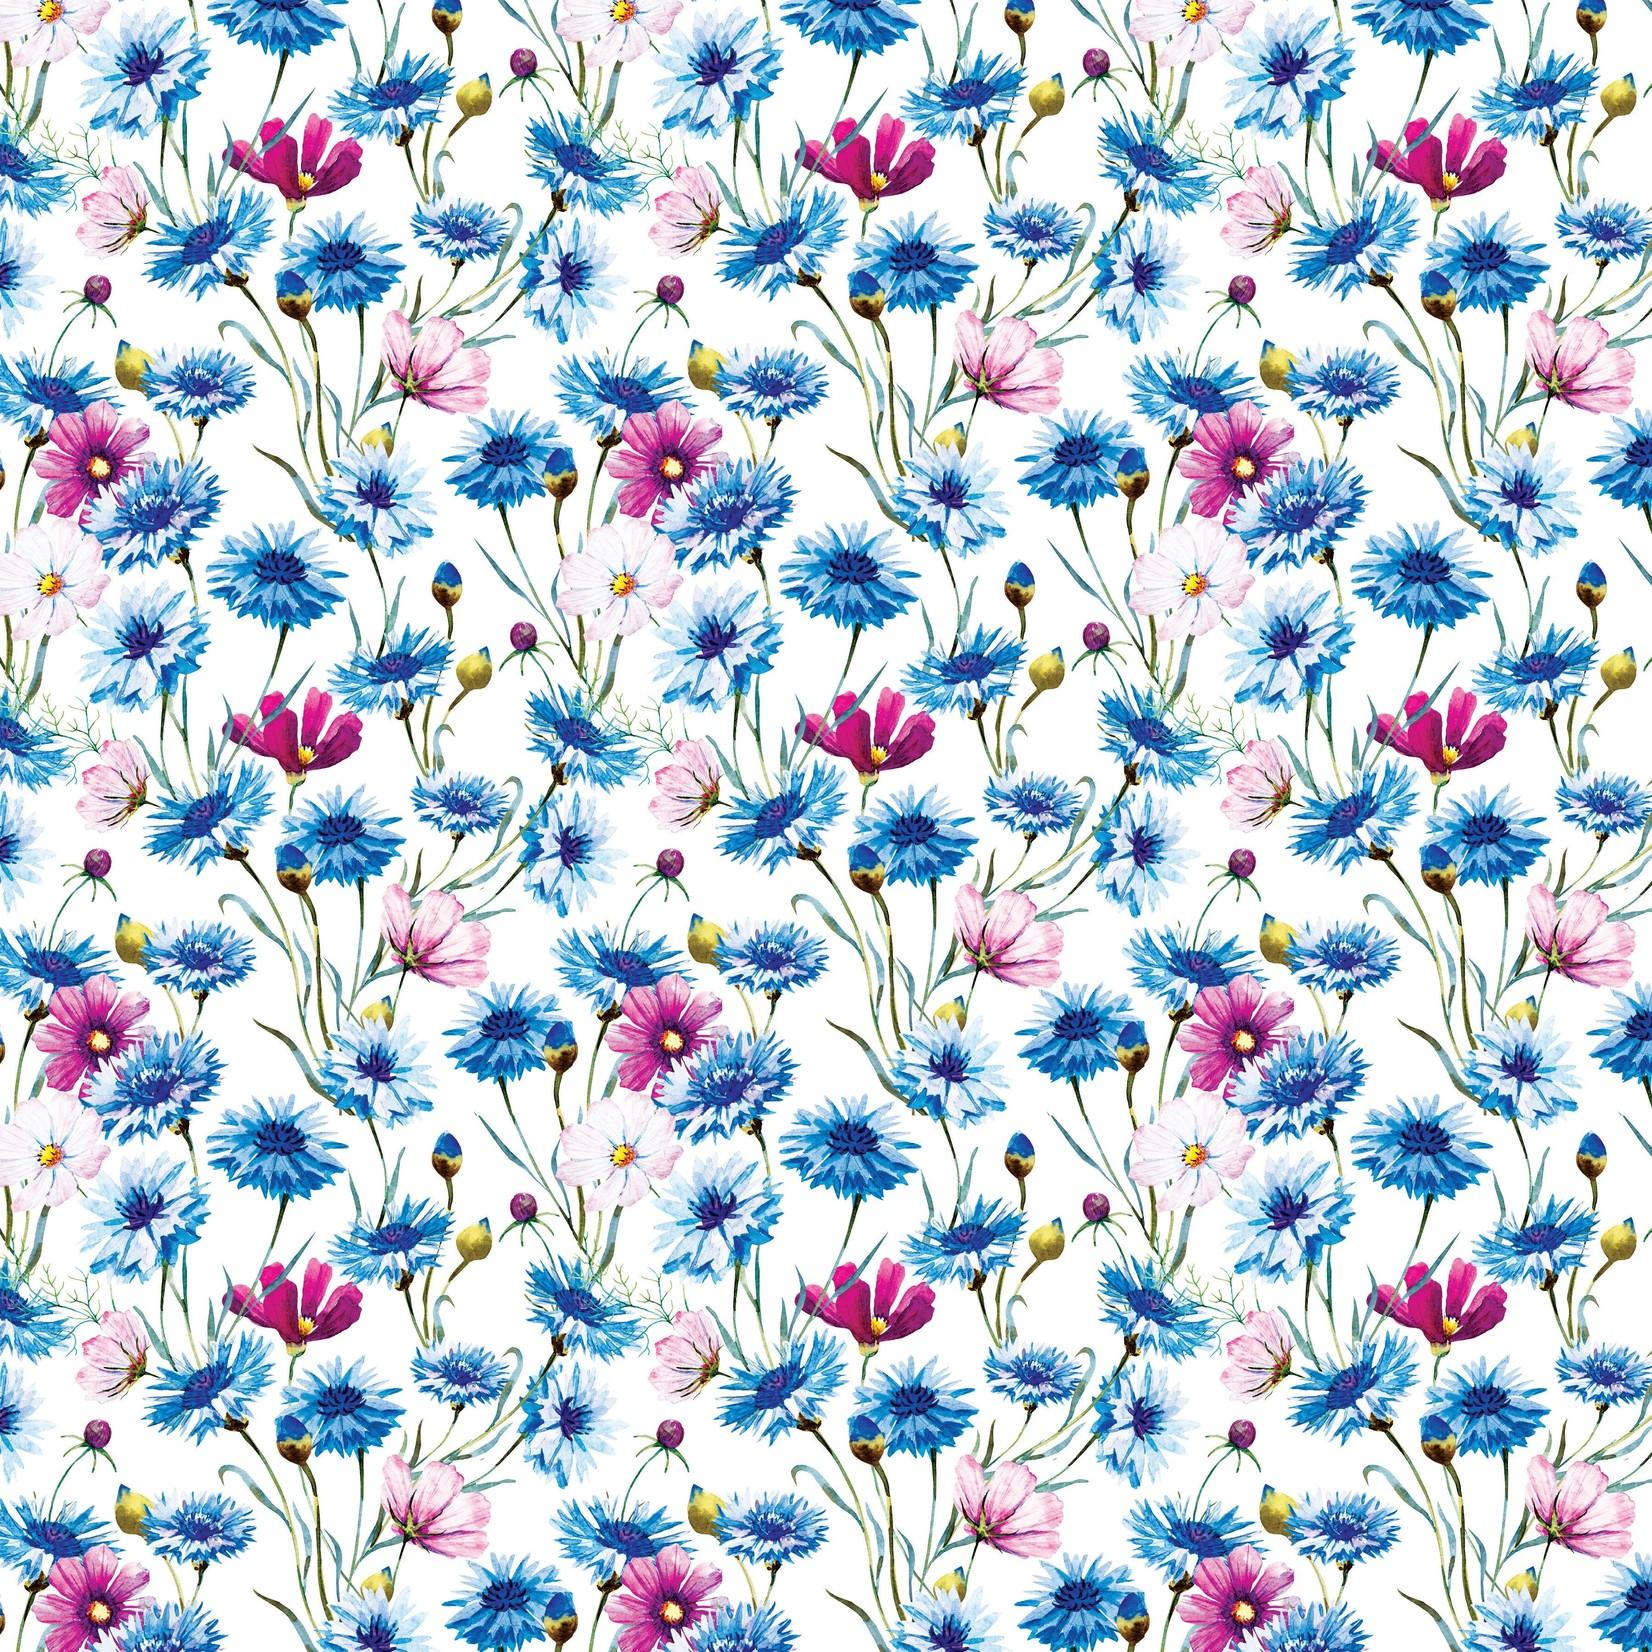 TVD Wildflowers